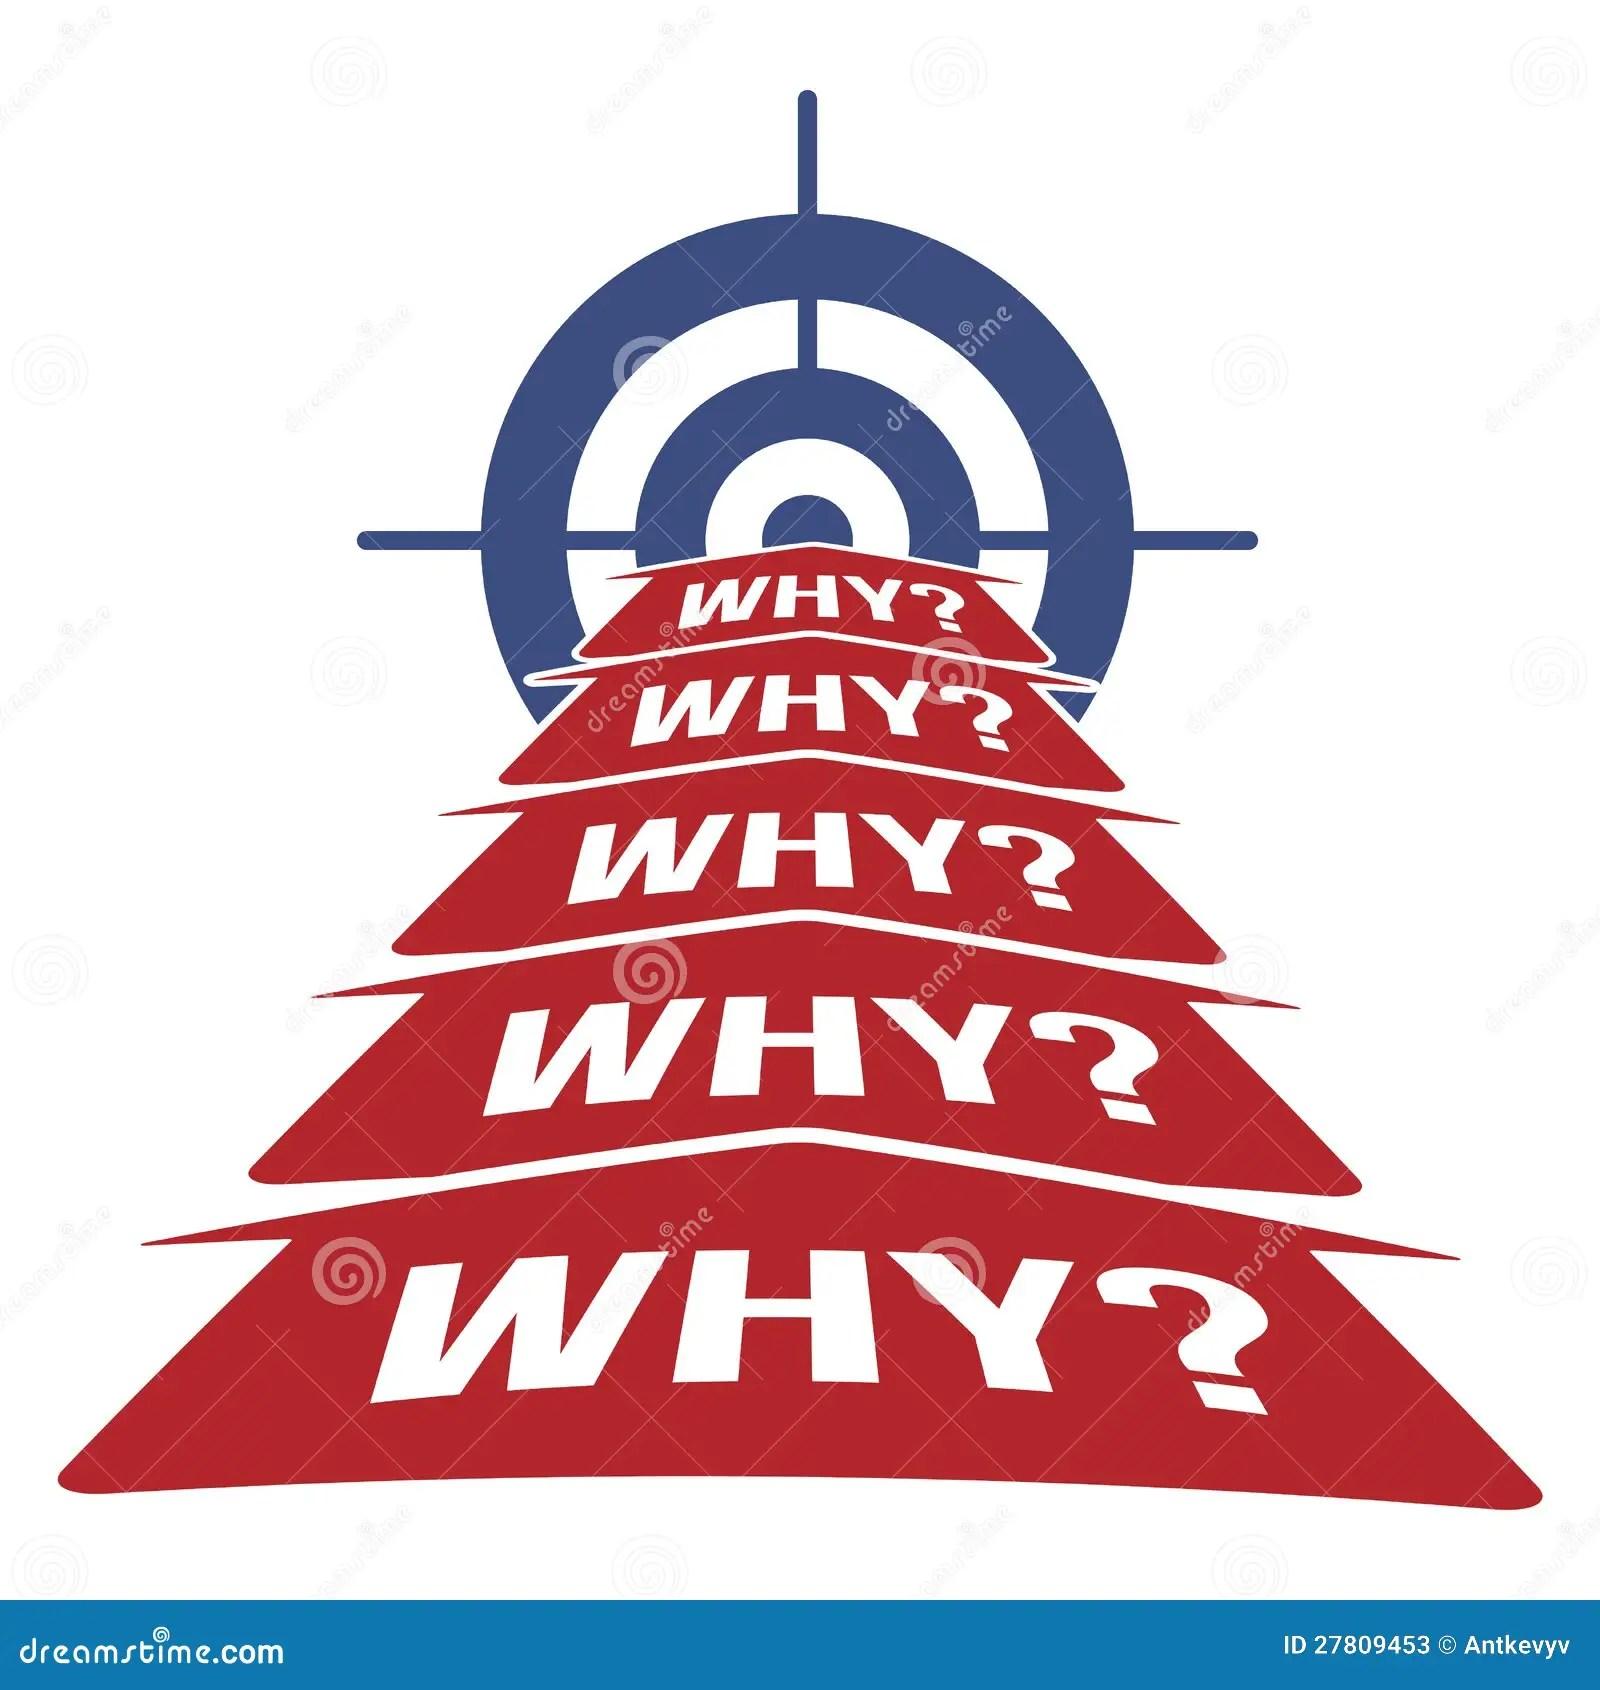 5 Why Methodology Concept Stock Photos